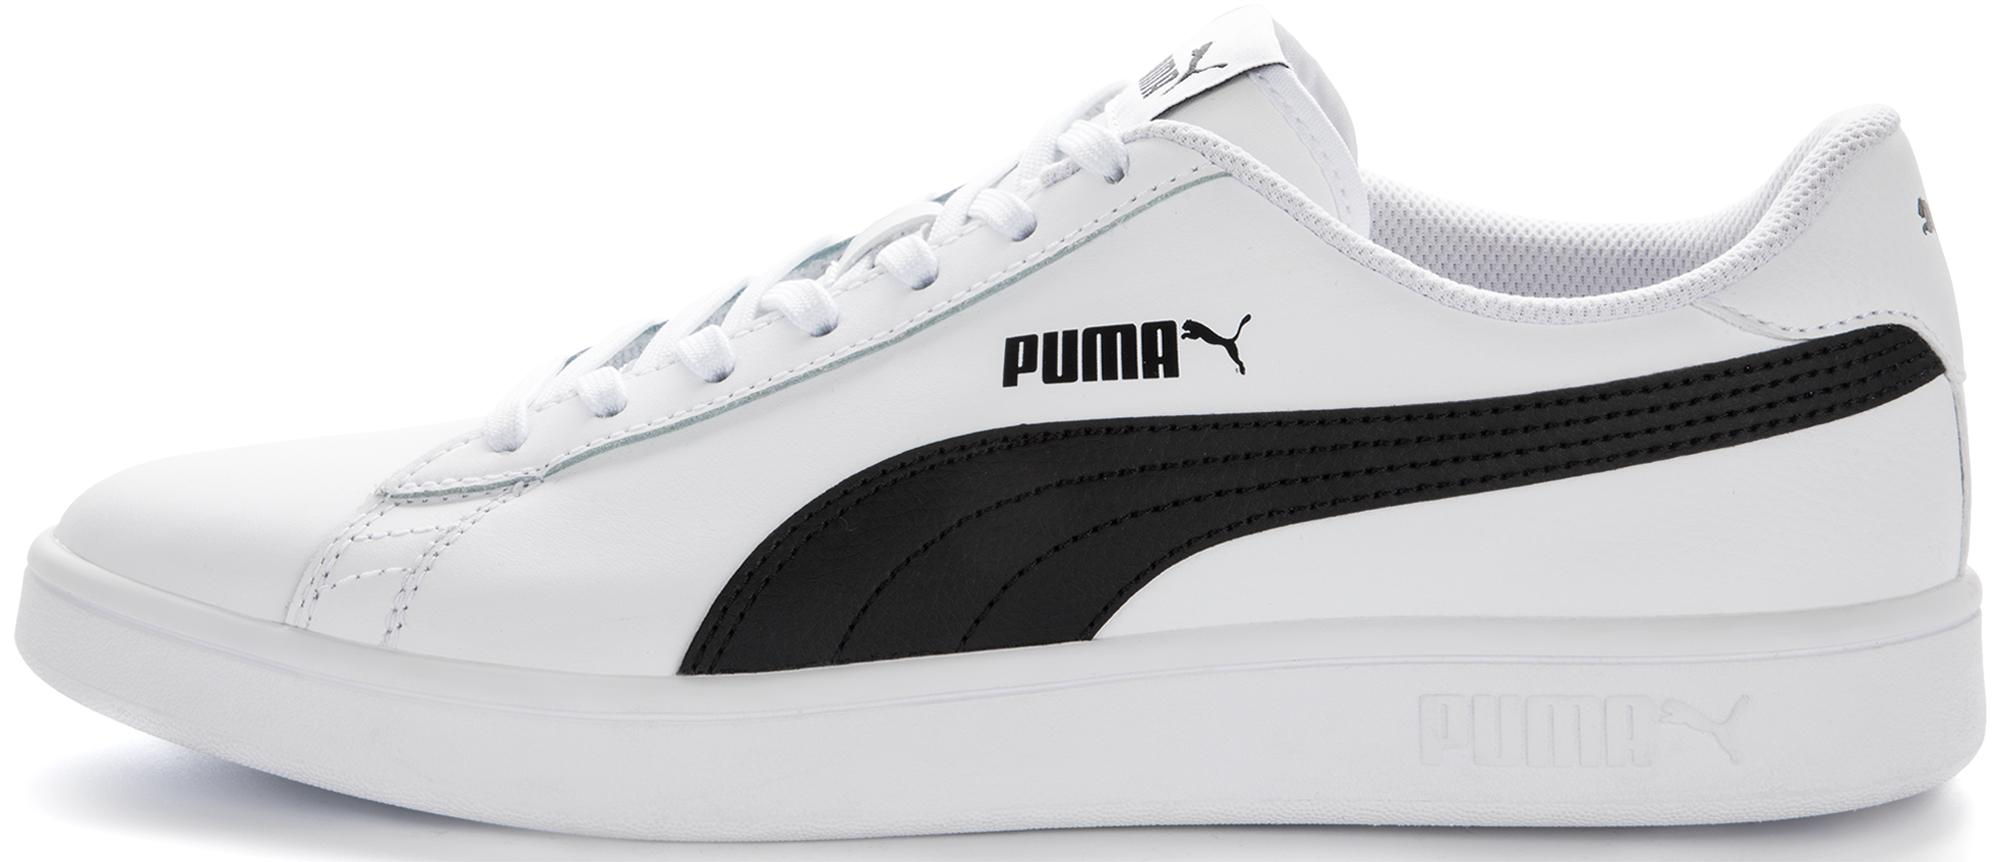 Puma Кеды мужские  Smash V2 L, размер 45